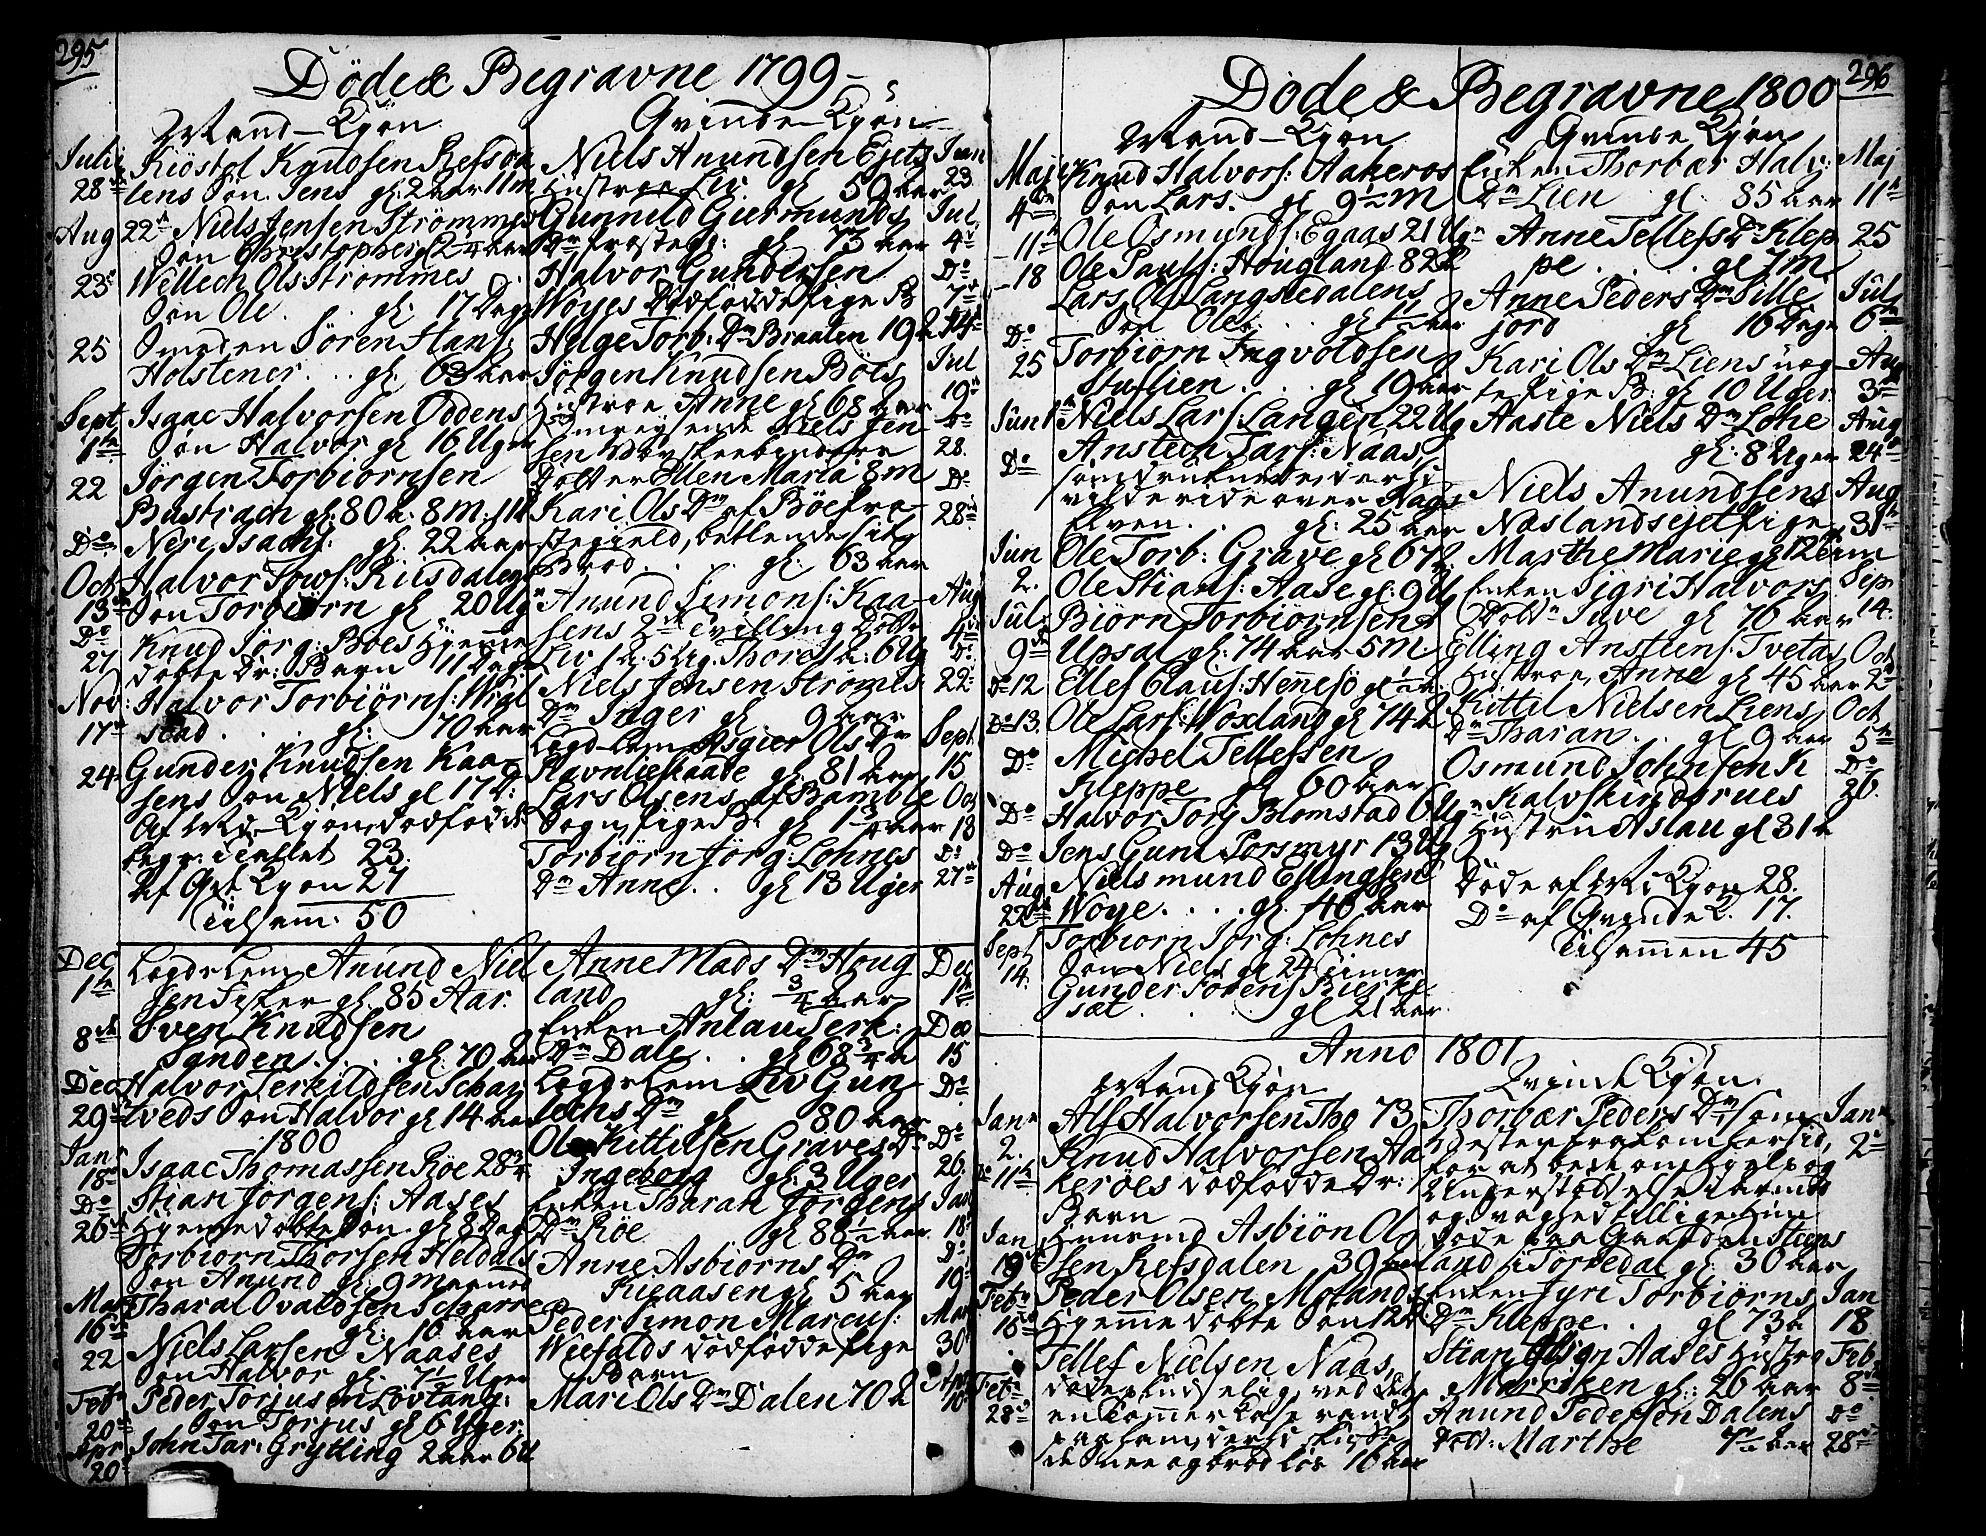 SAKO, Drangedal kirkebøker, F/Fa/L0003: Ministerialbok nr. 3, 1768-1814, s. 295-296